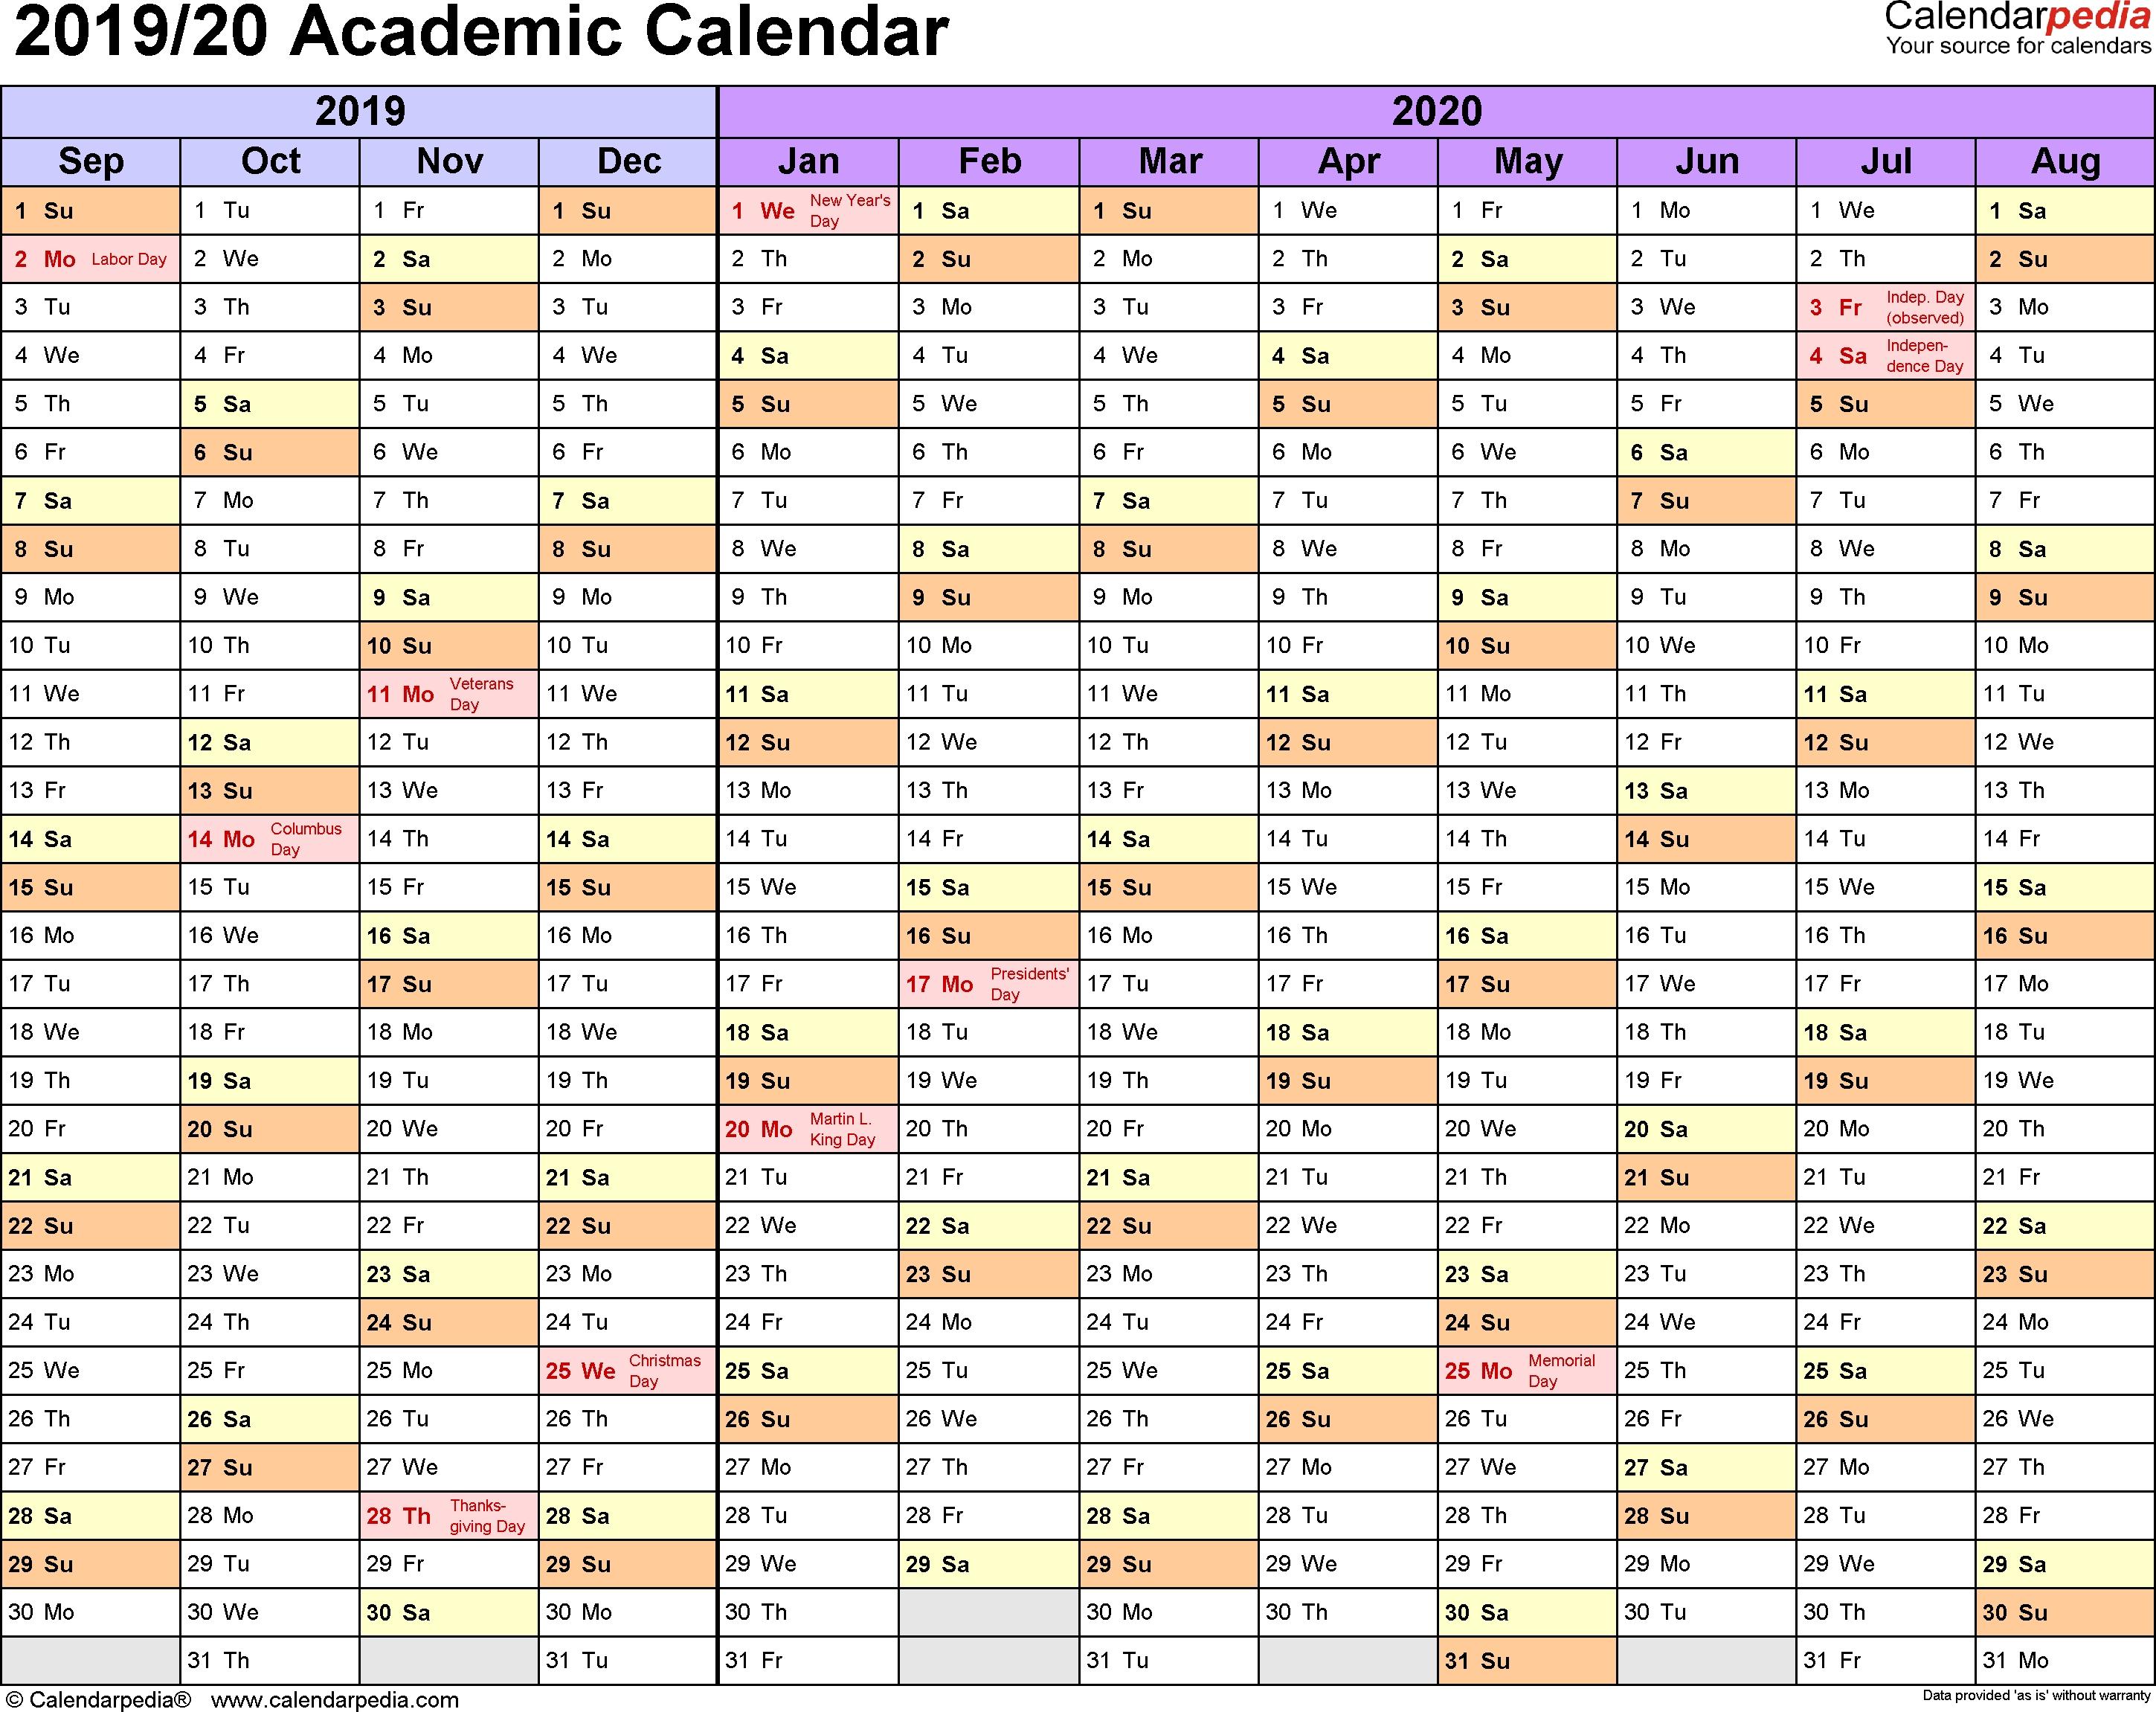 Academic Calendars 2019/2020 - Free Printable Excel Templates intended for 2019-2020 Calendar Vertex